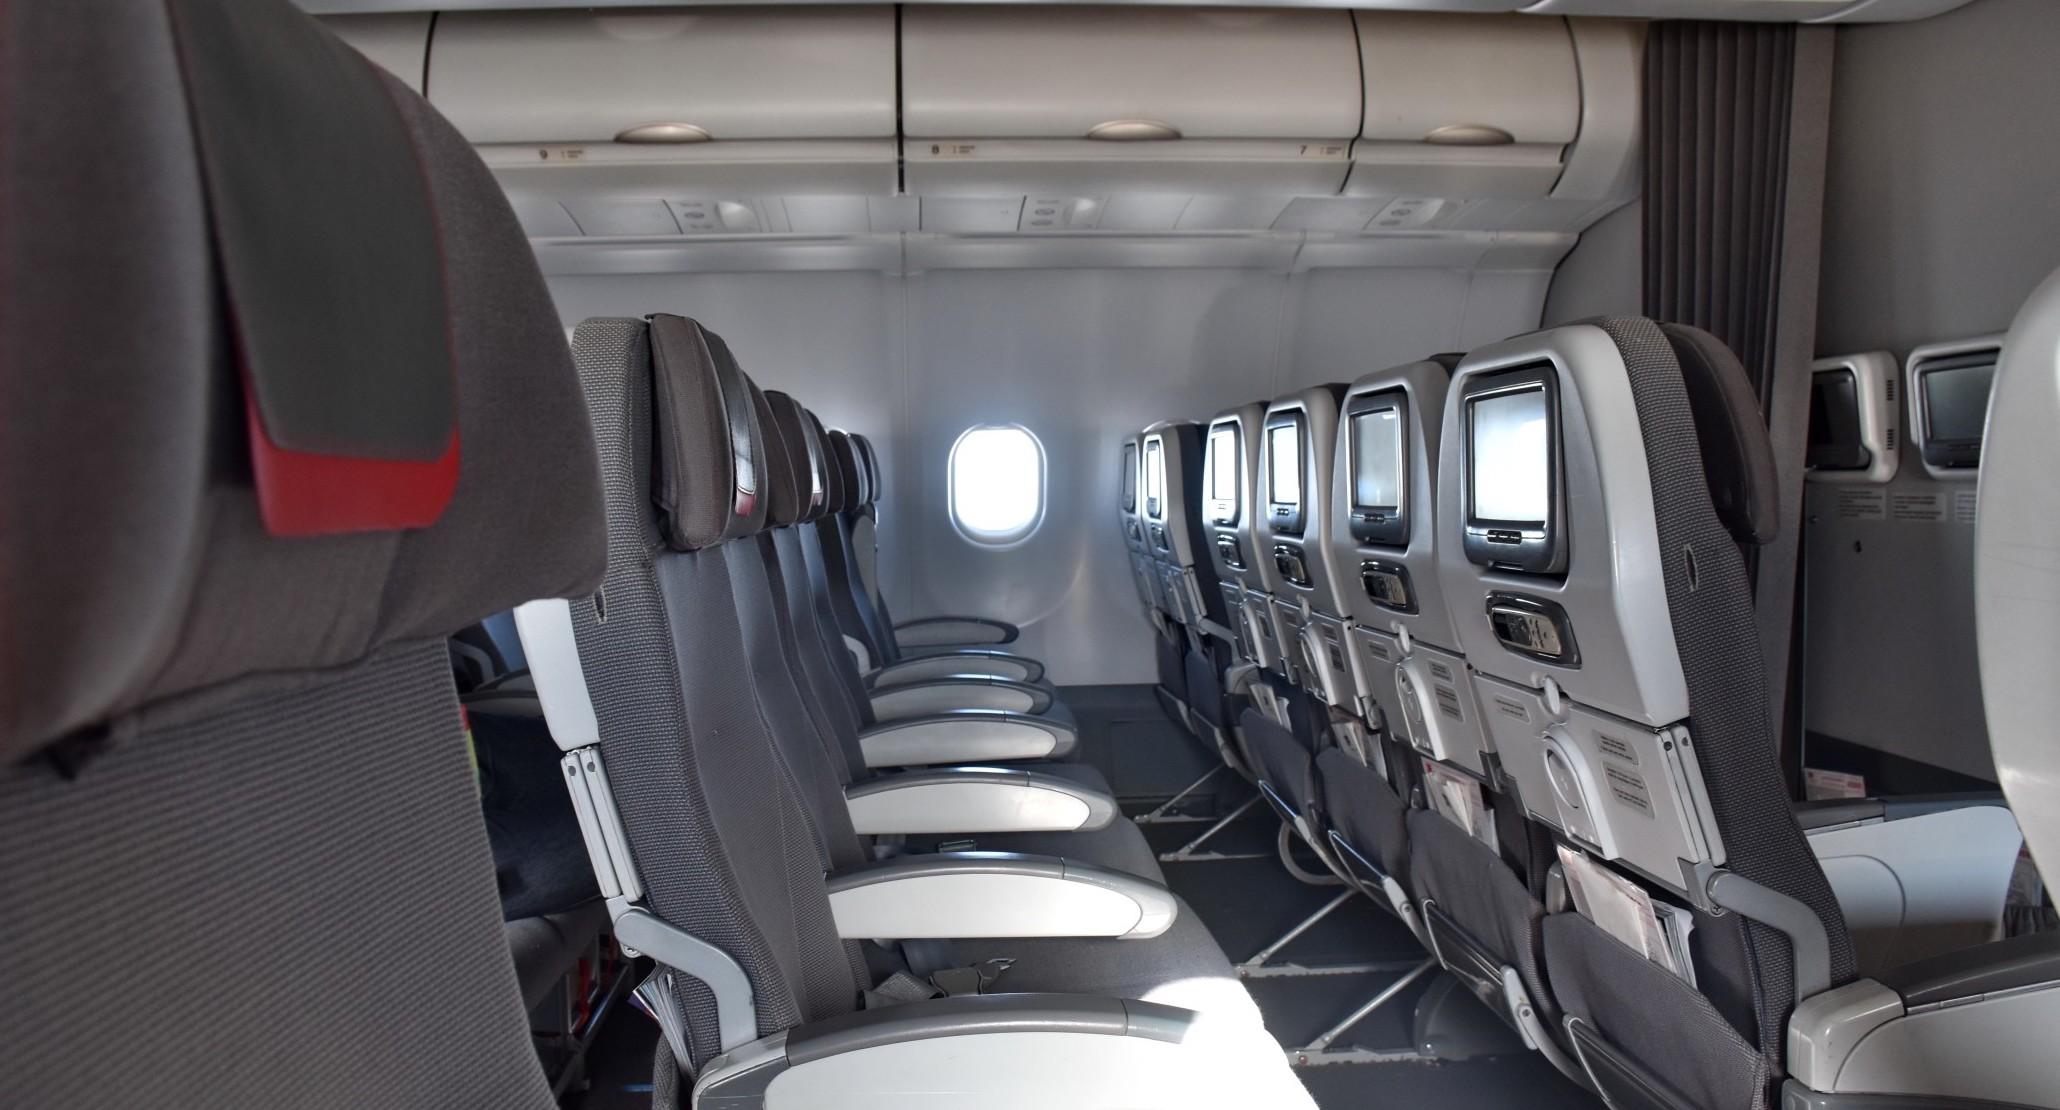 empty plane seats, future of travel after coronavirus